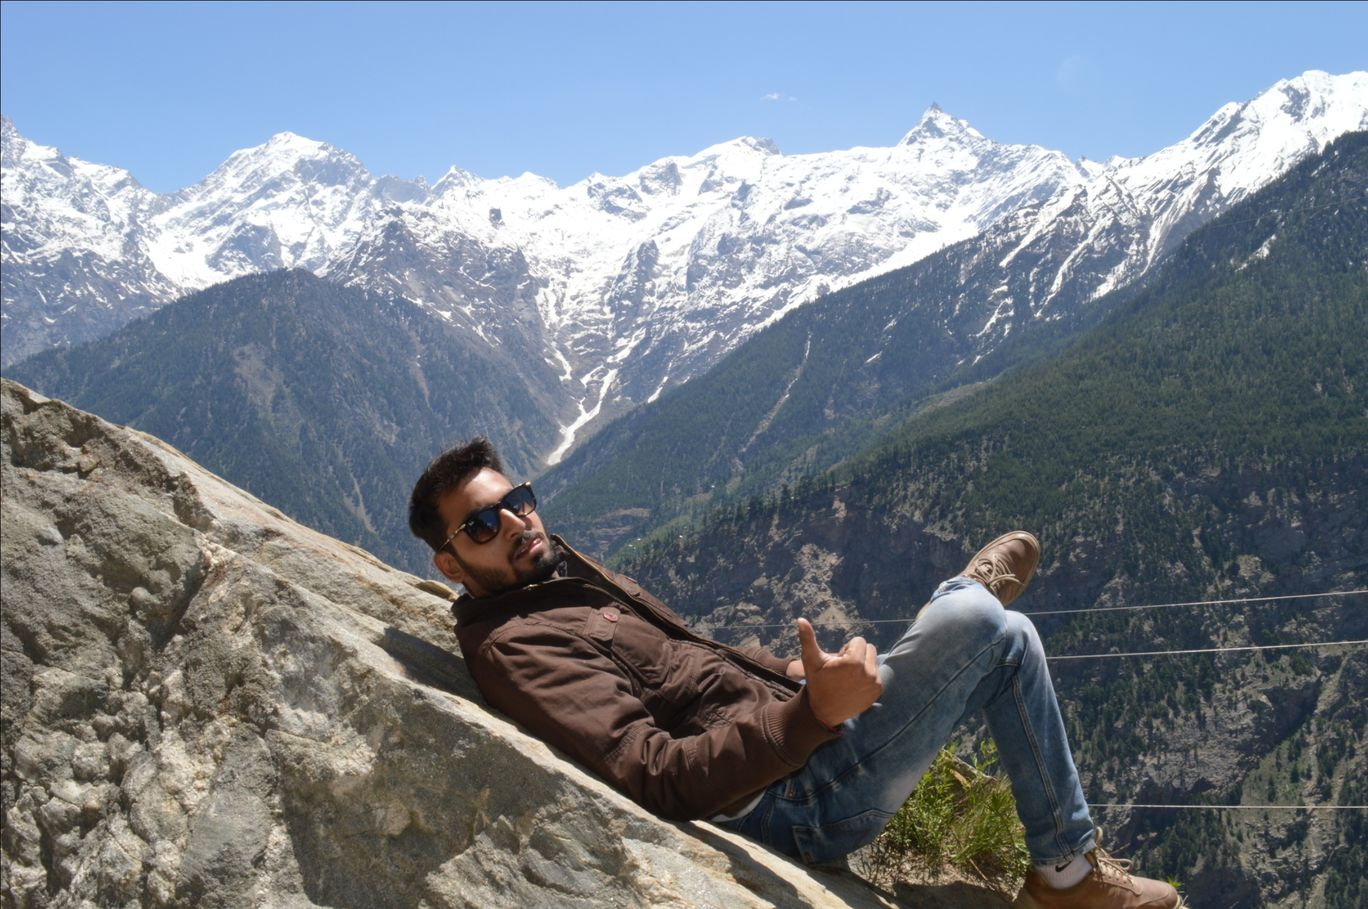 Photo of Himachal Pradesh By Vaibhav Koolwal